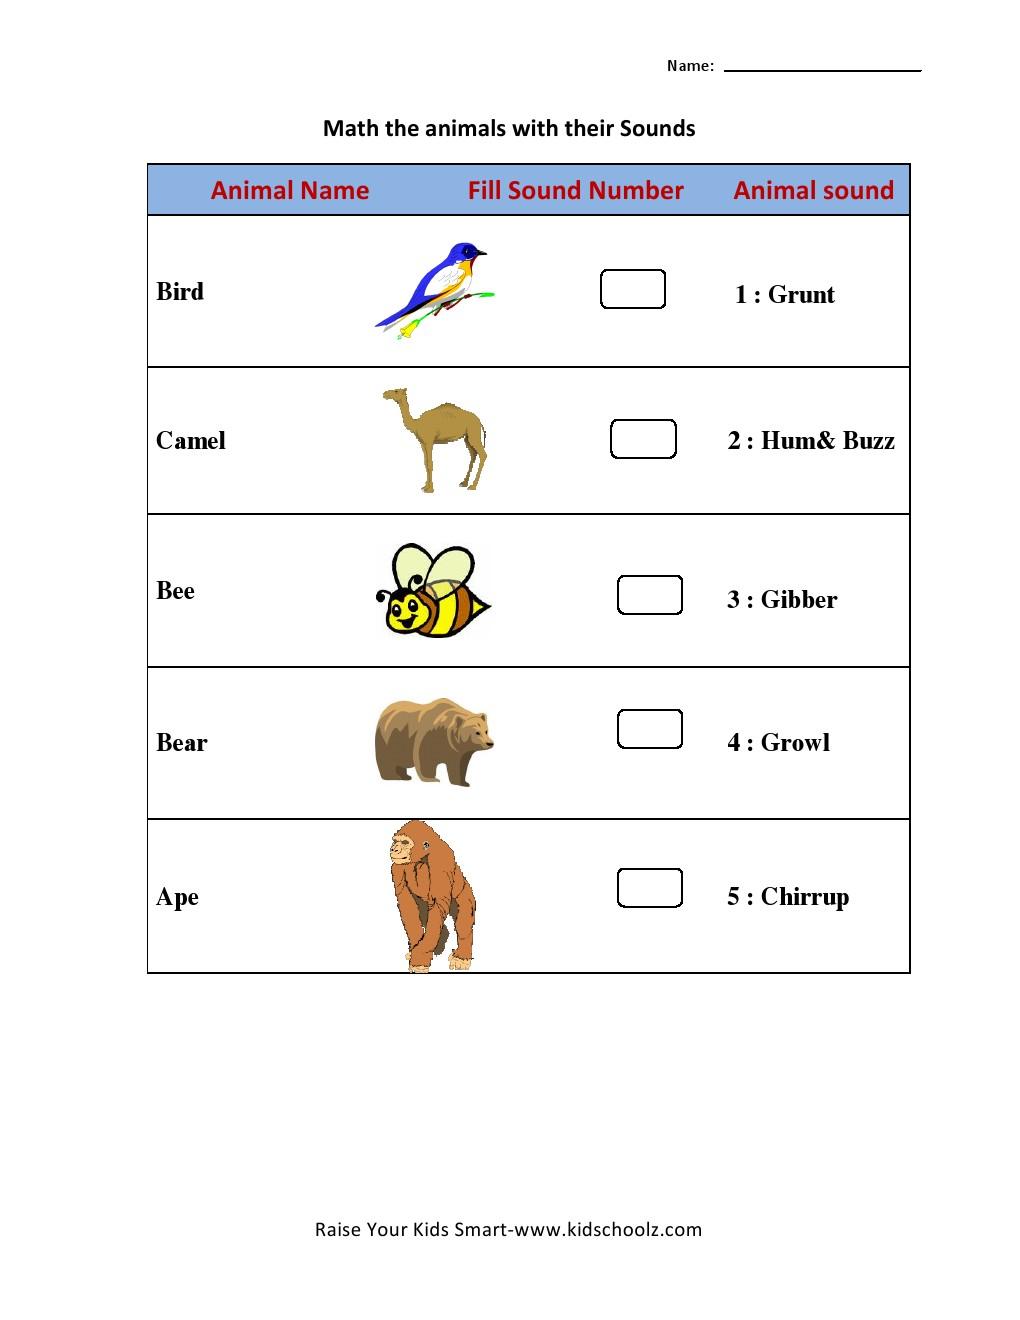 Animal Sound Matching Worksheets Kidschoolz Kindergarten Writing